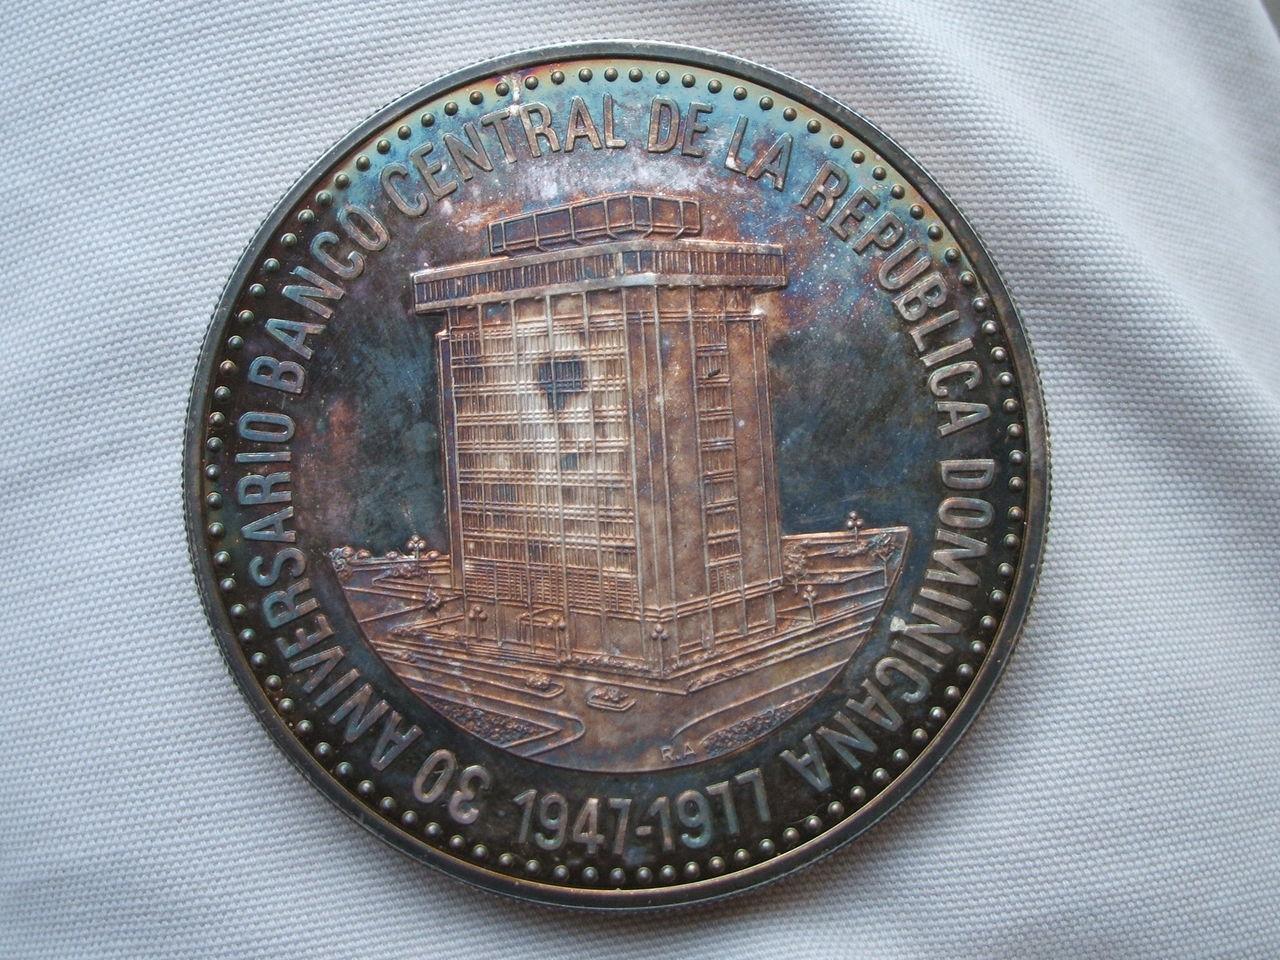 30 Pesos. R. Dominicana. 1977 009